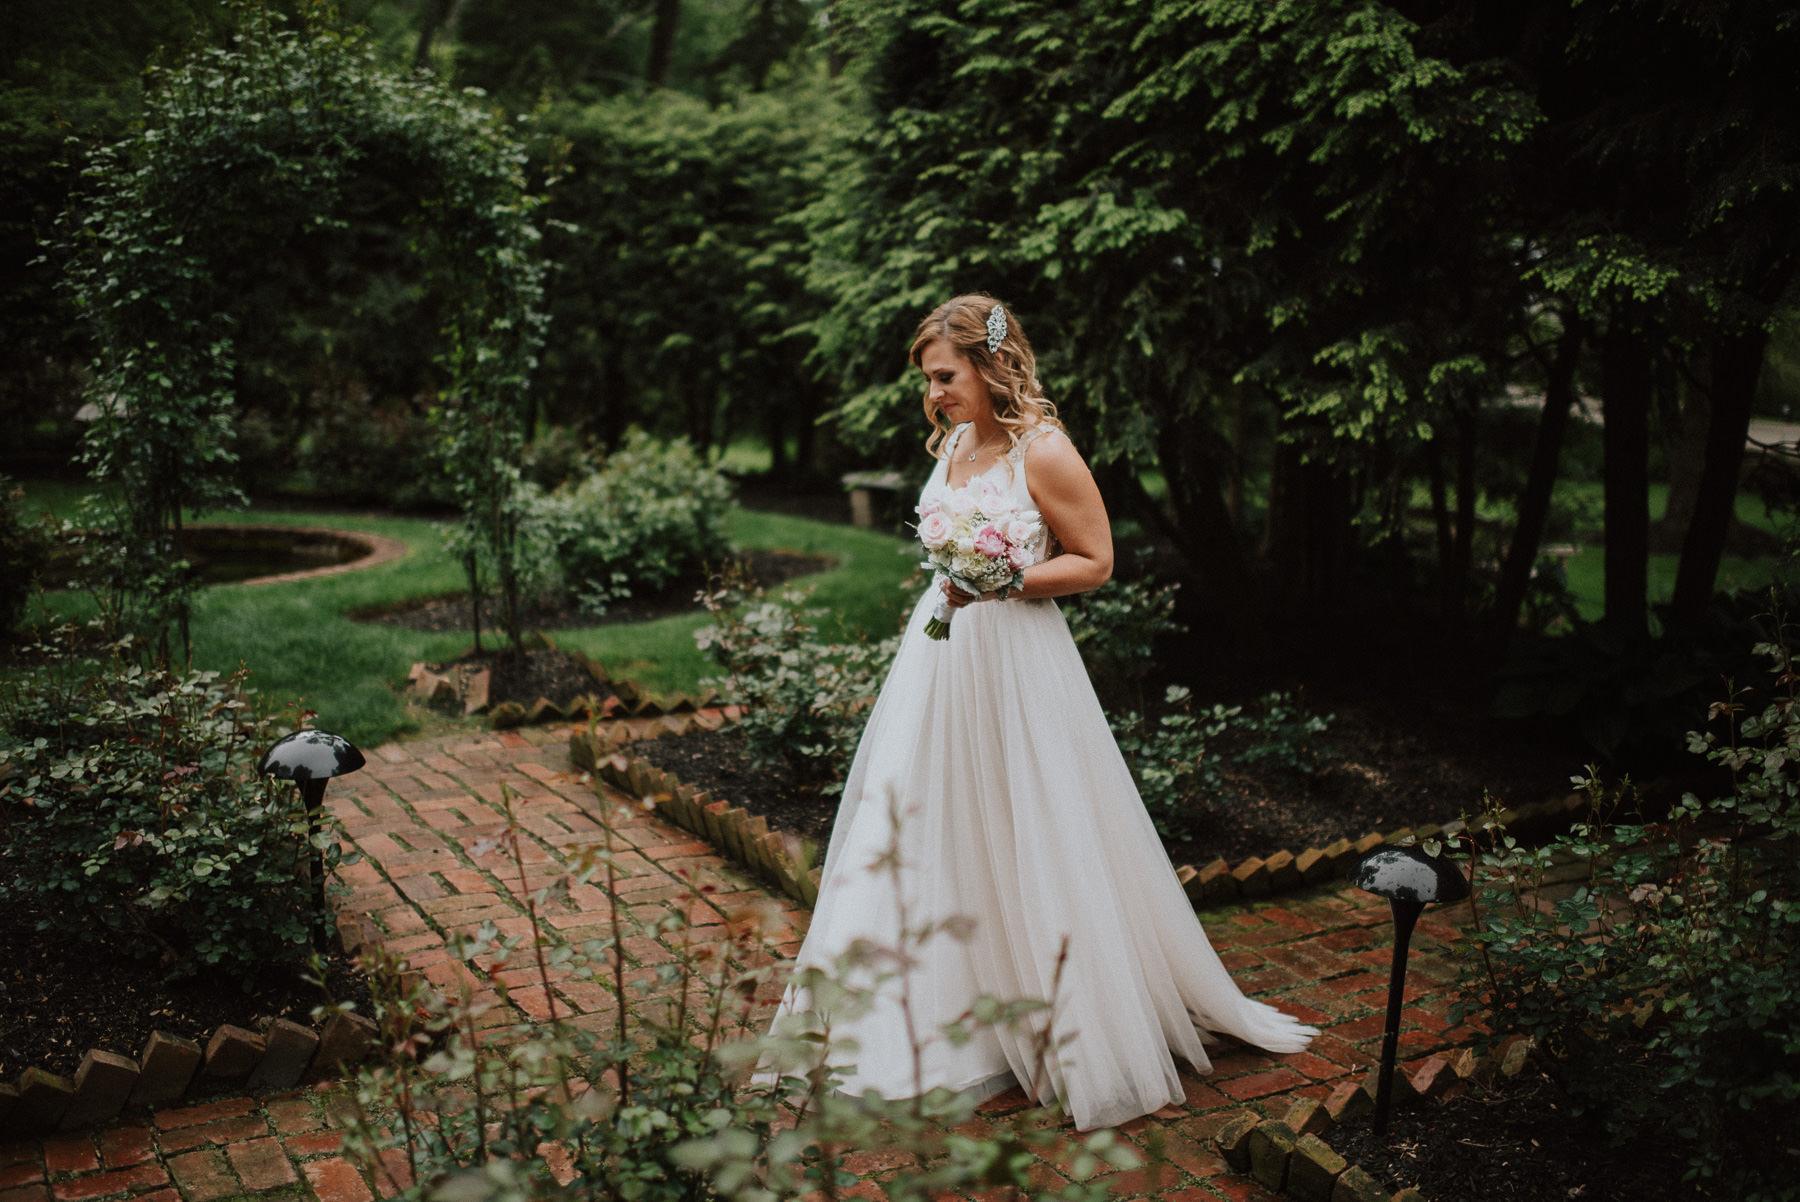 appleford-estate-wedding-photography-28.jpg